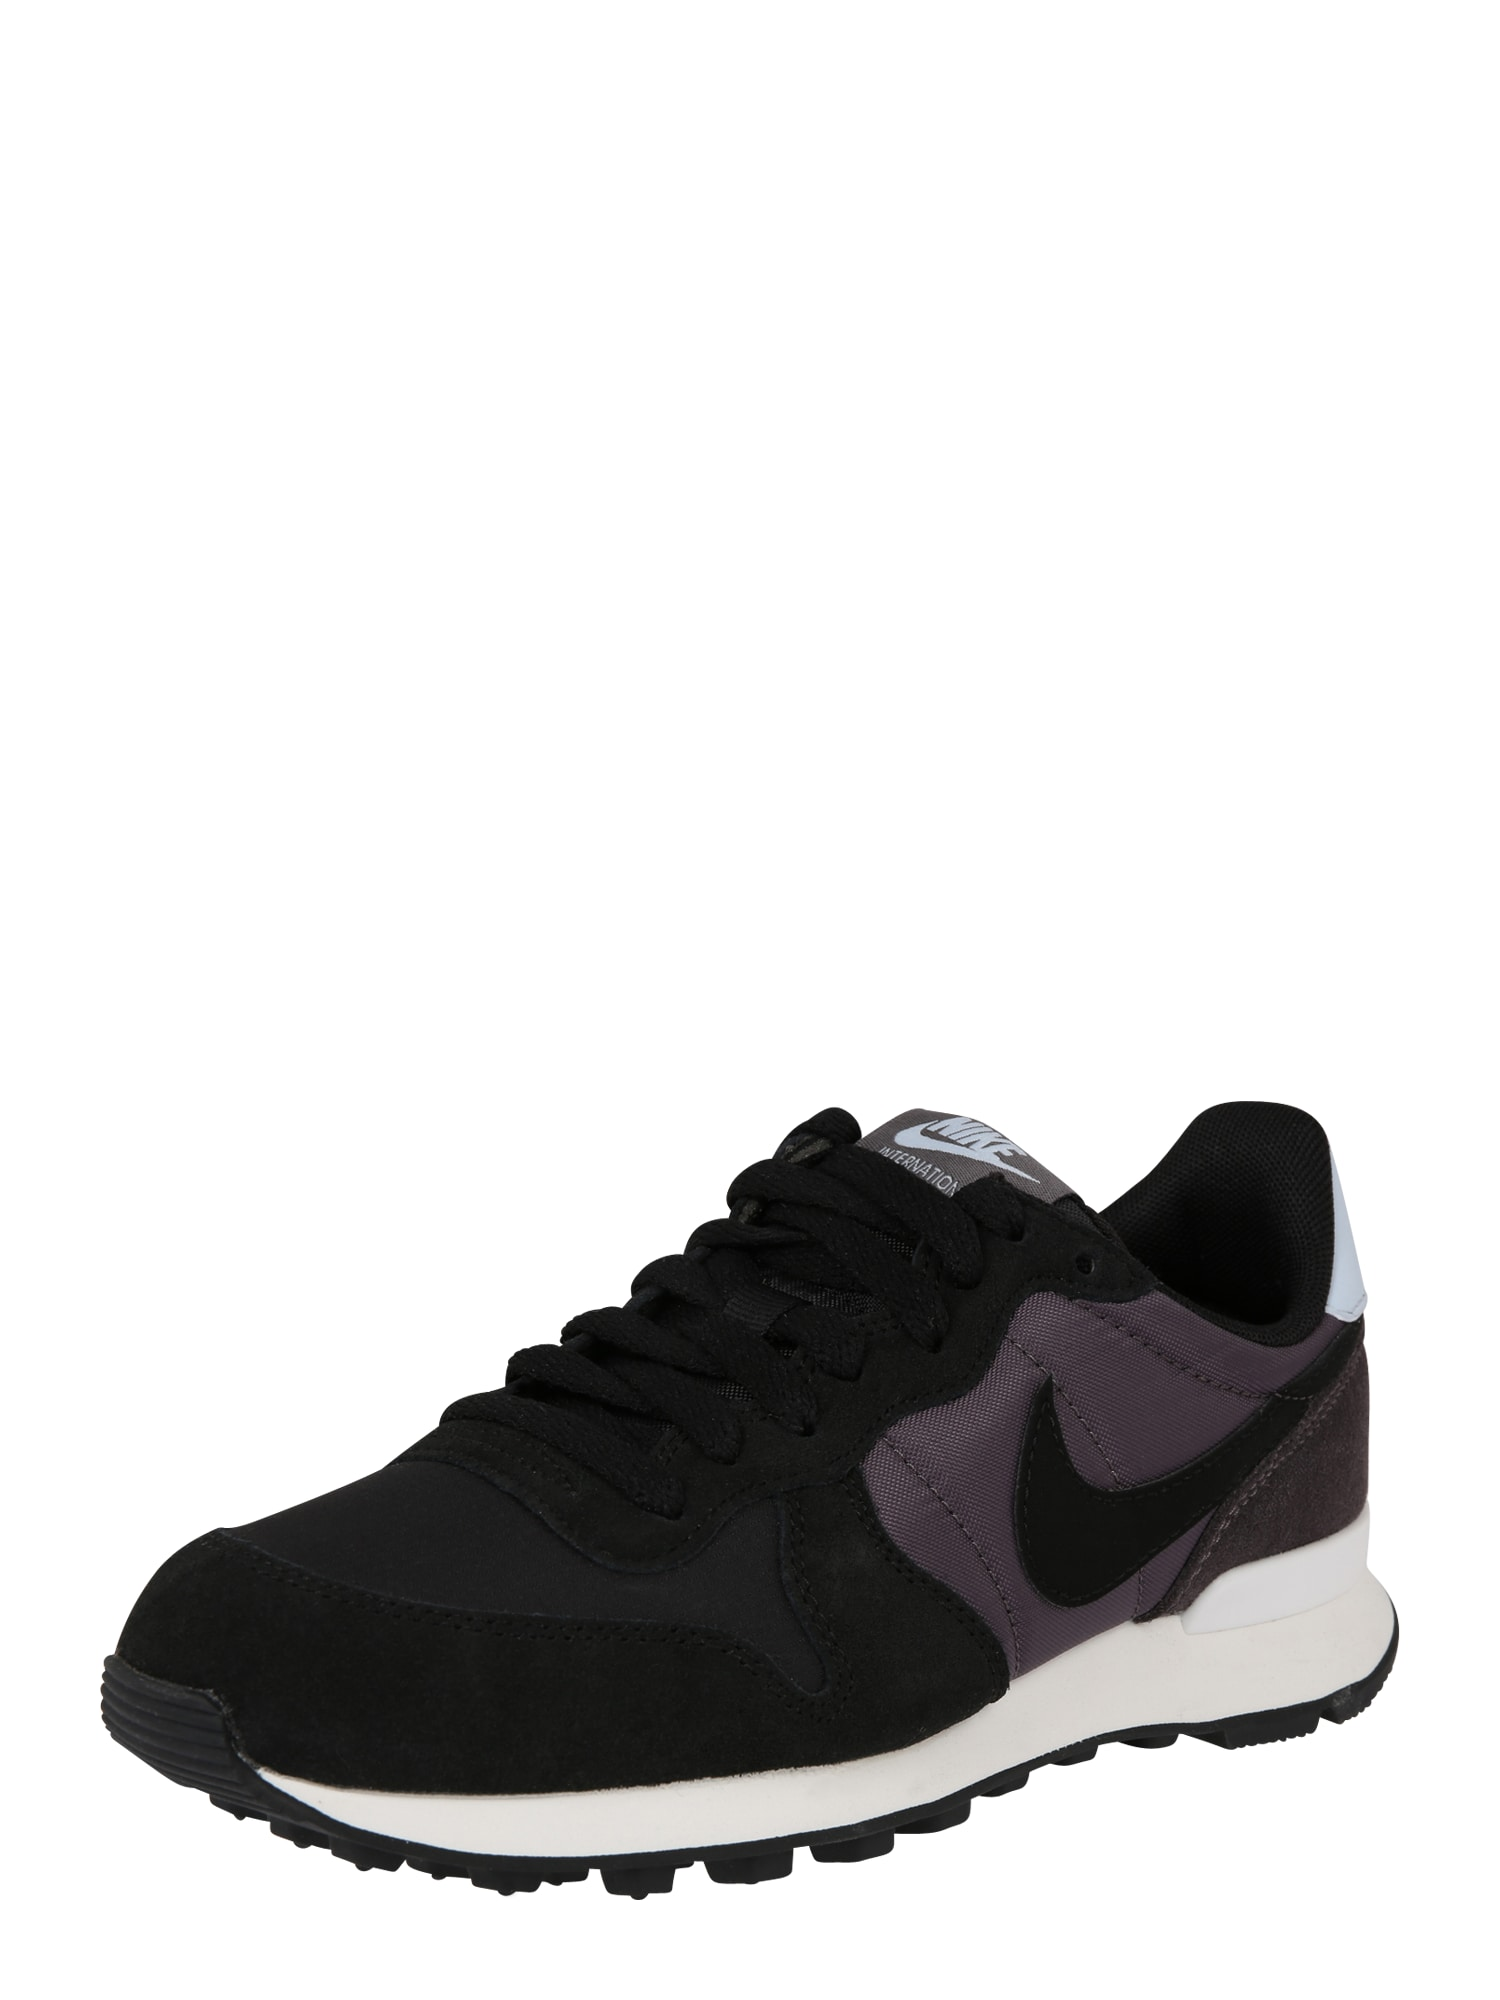 Tenisky Internationalist černá Nike Sportswear